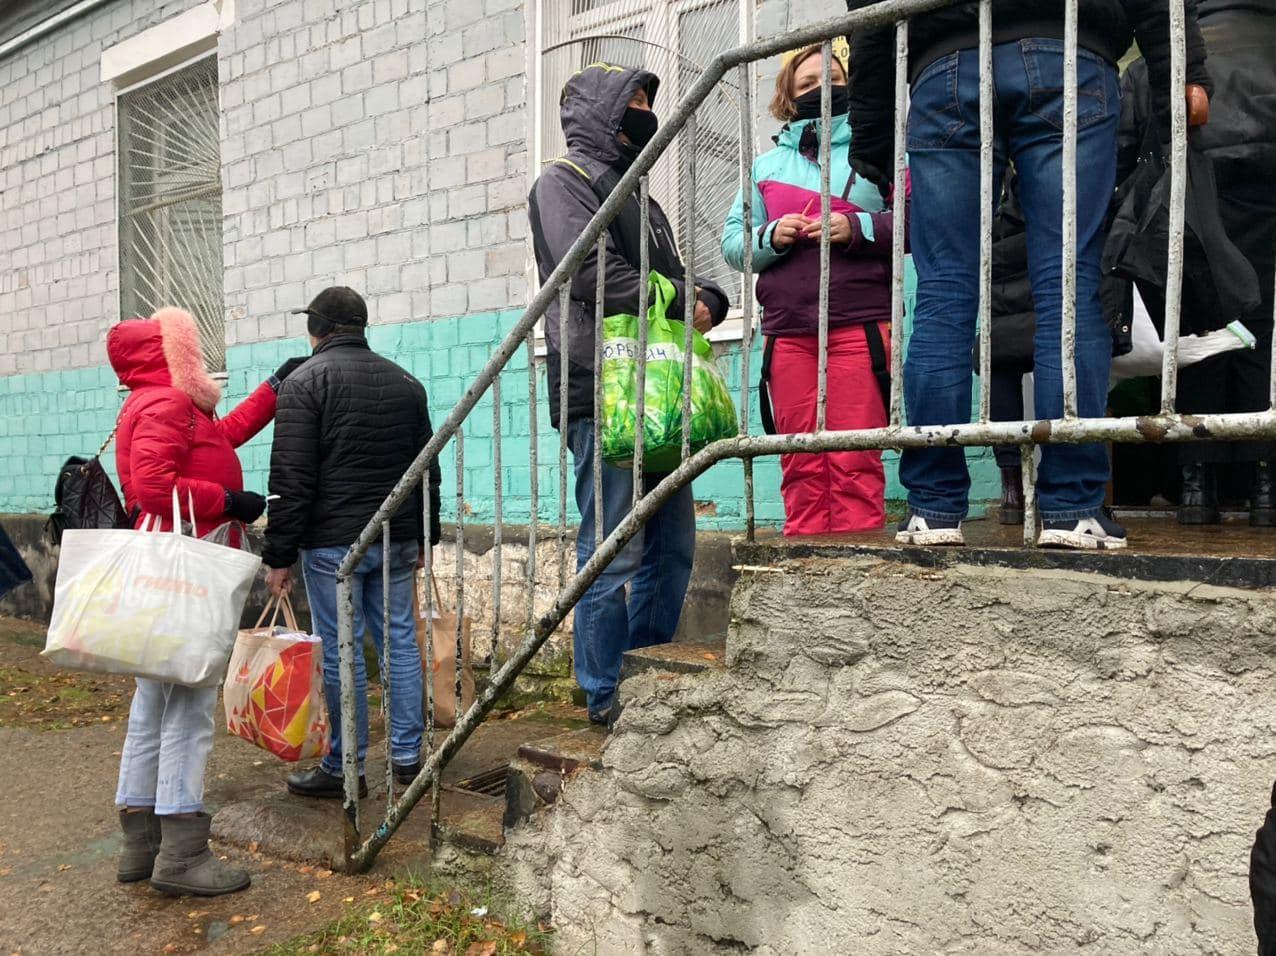 Очередь в комнату приема передач в СИЗО №6 г. Барановичи во вторник, 17 ноября. Фото: Ирина КОМИК